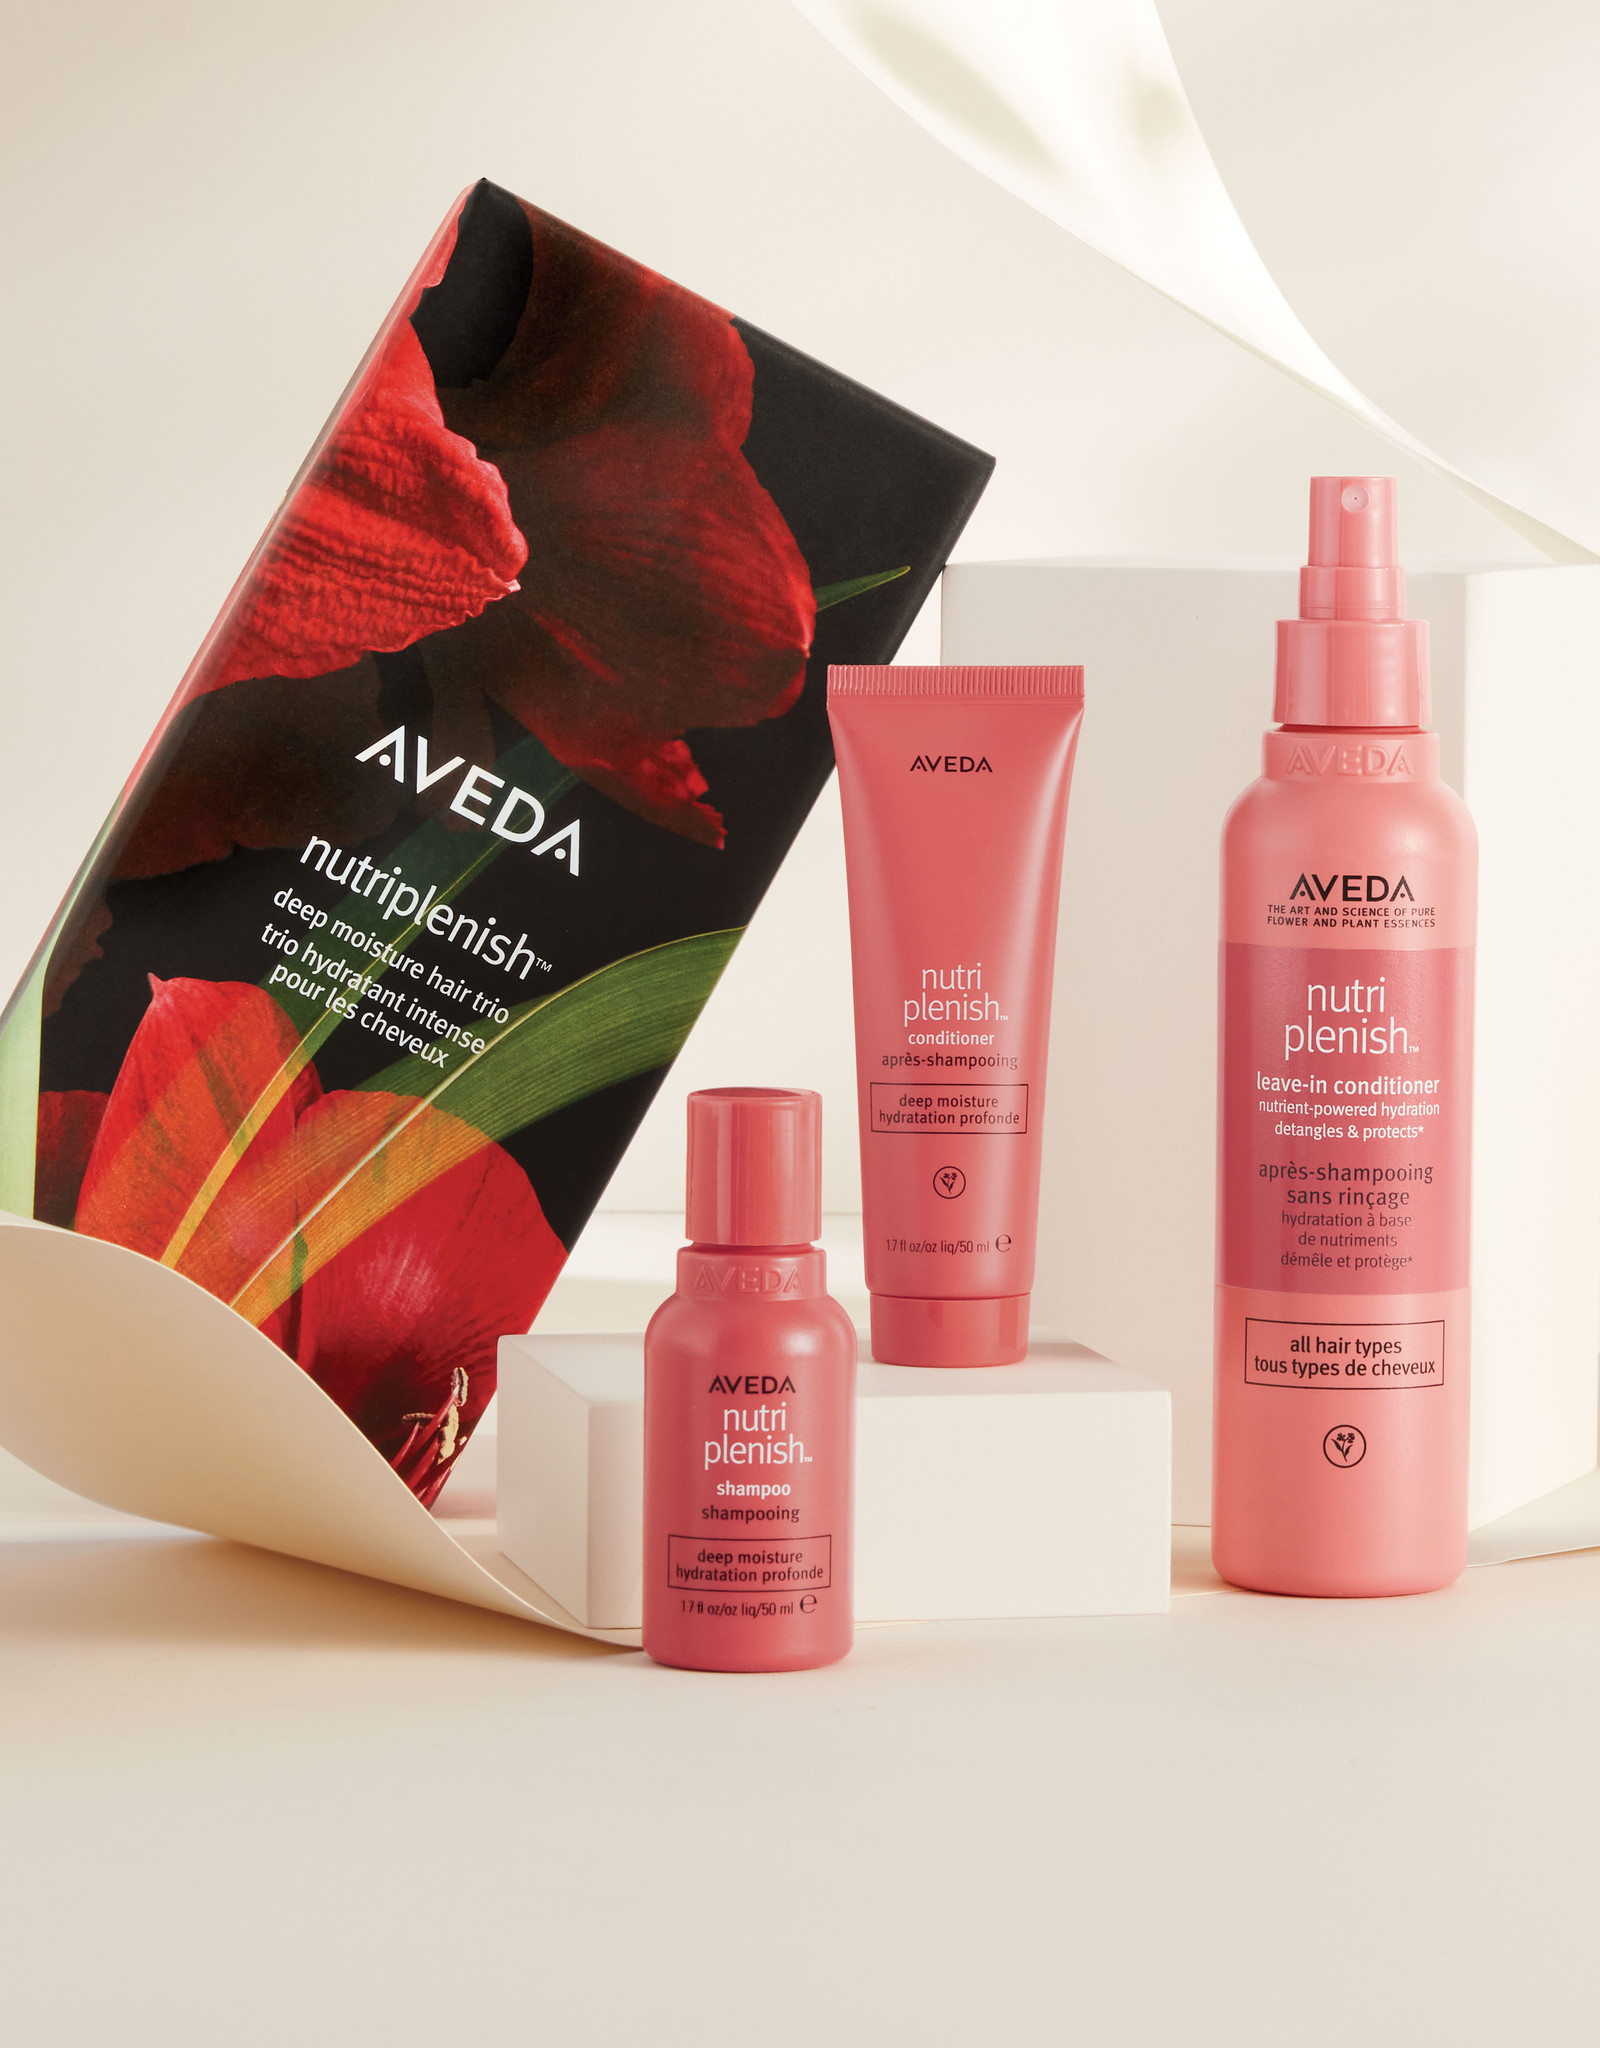 AVEDA Nutriplenish™ Deep Moisture Hair Trio